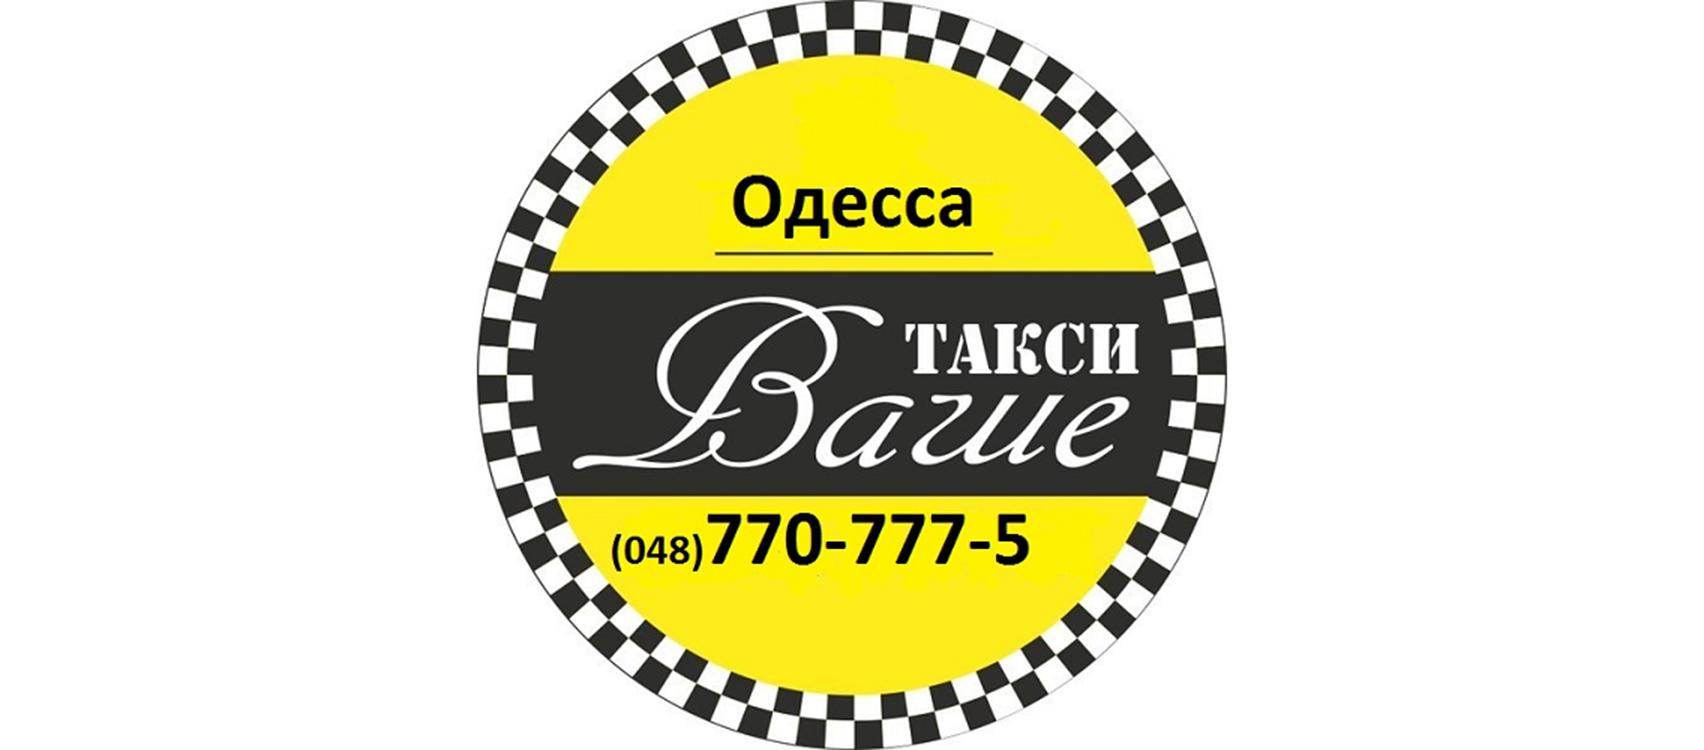 Ваше Таксі  (Одеса та обл, Київ та обл.)